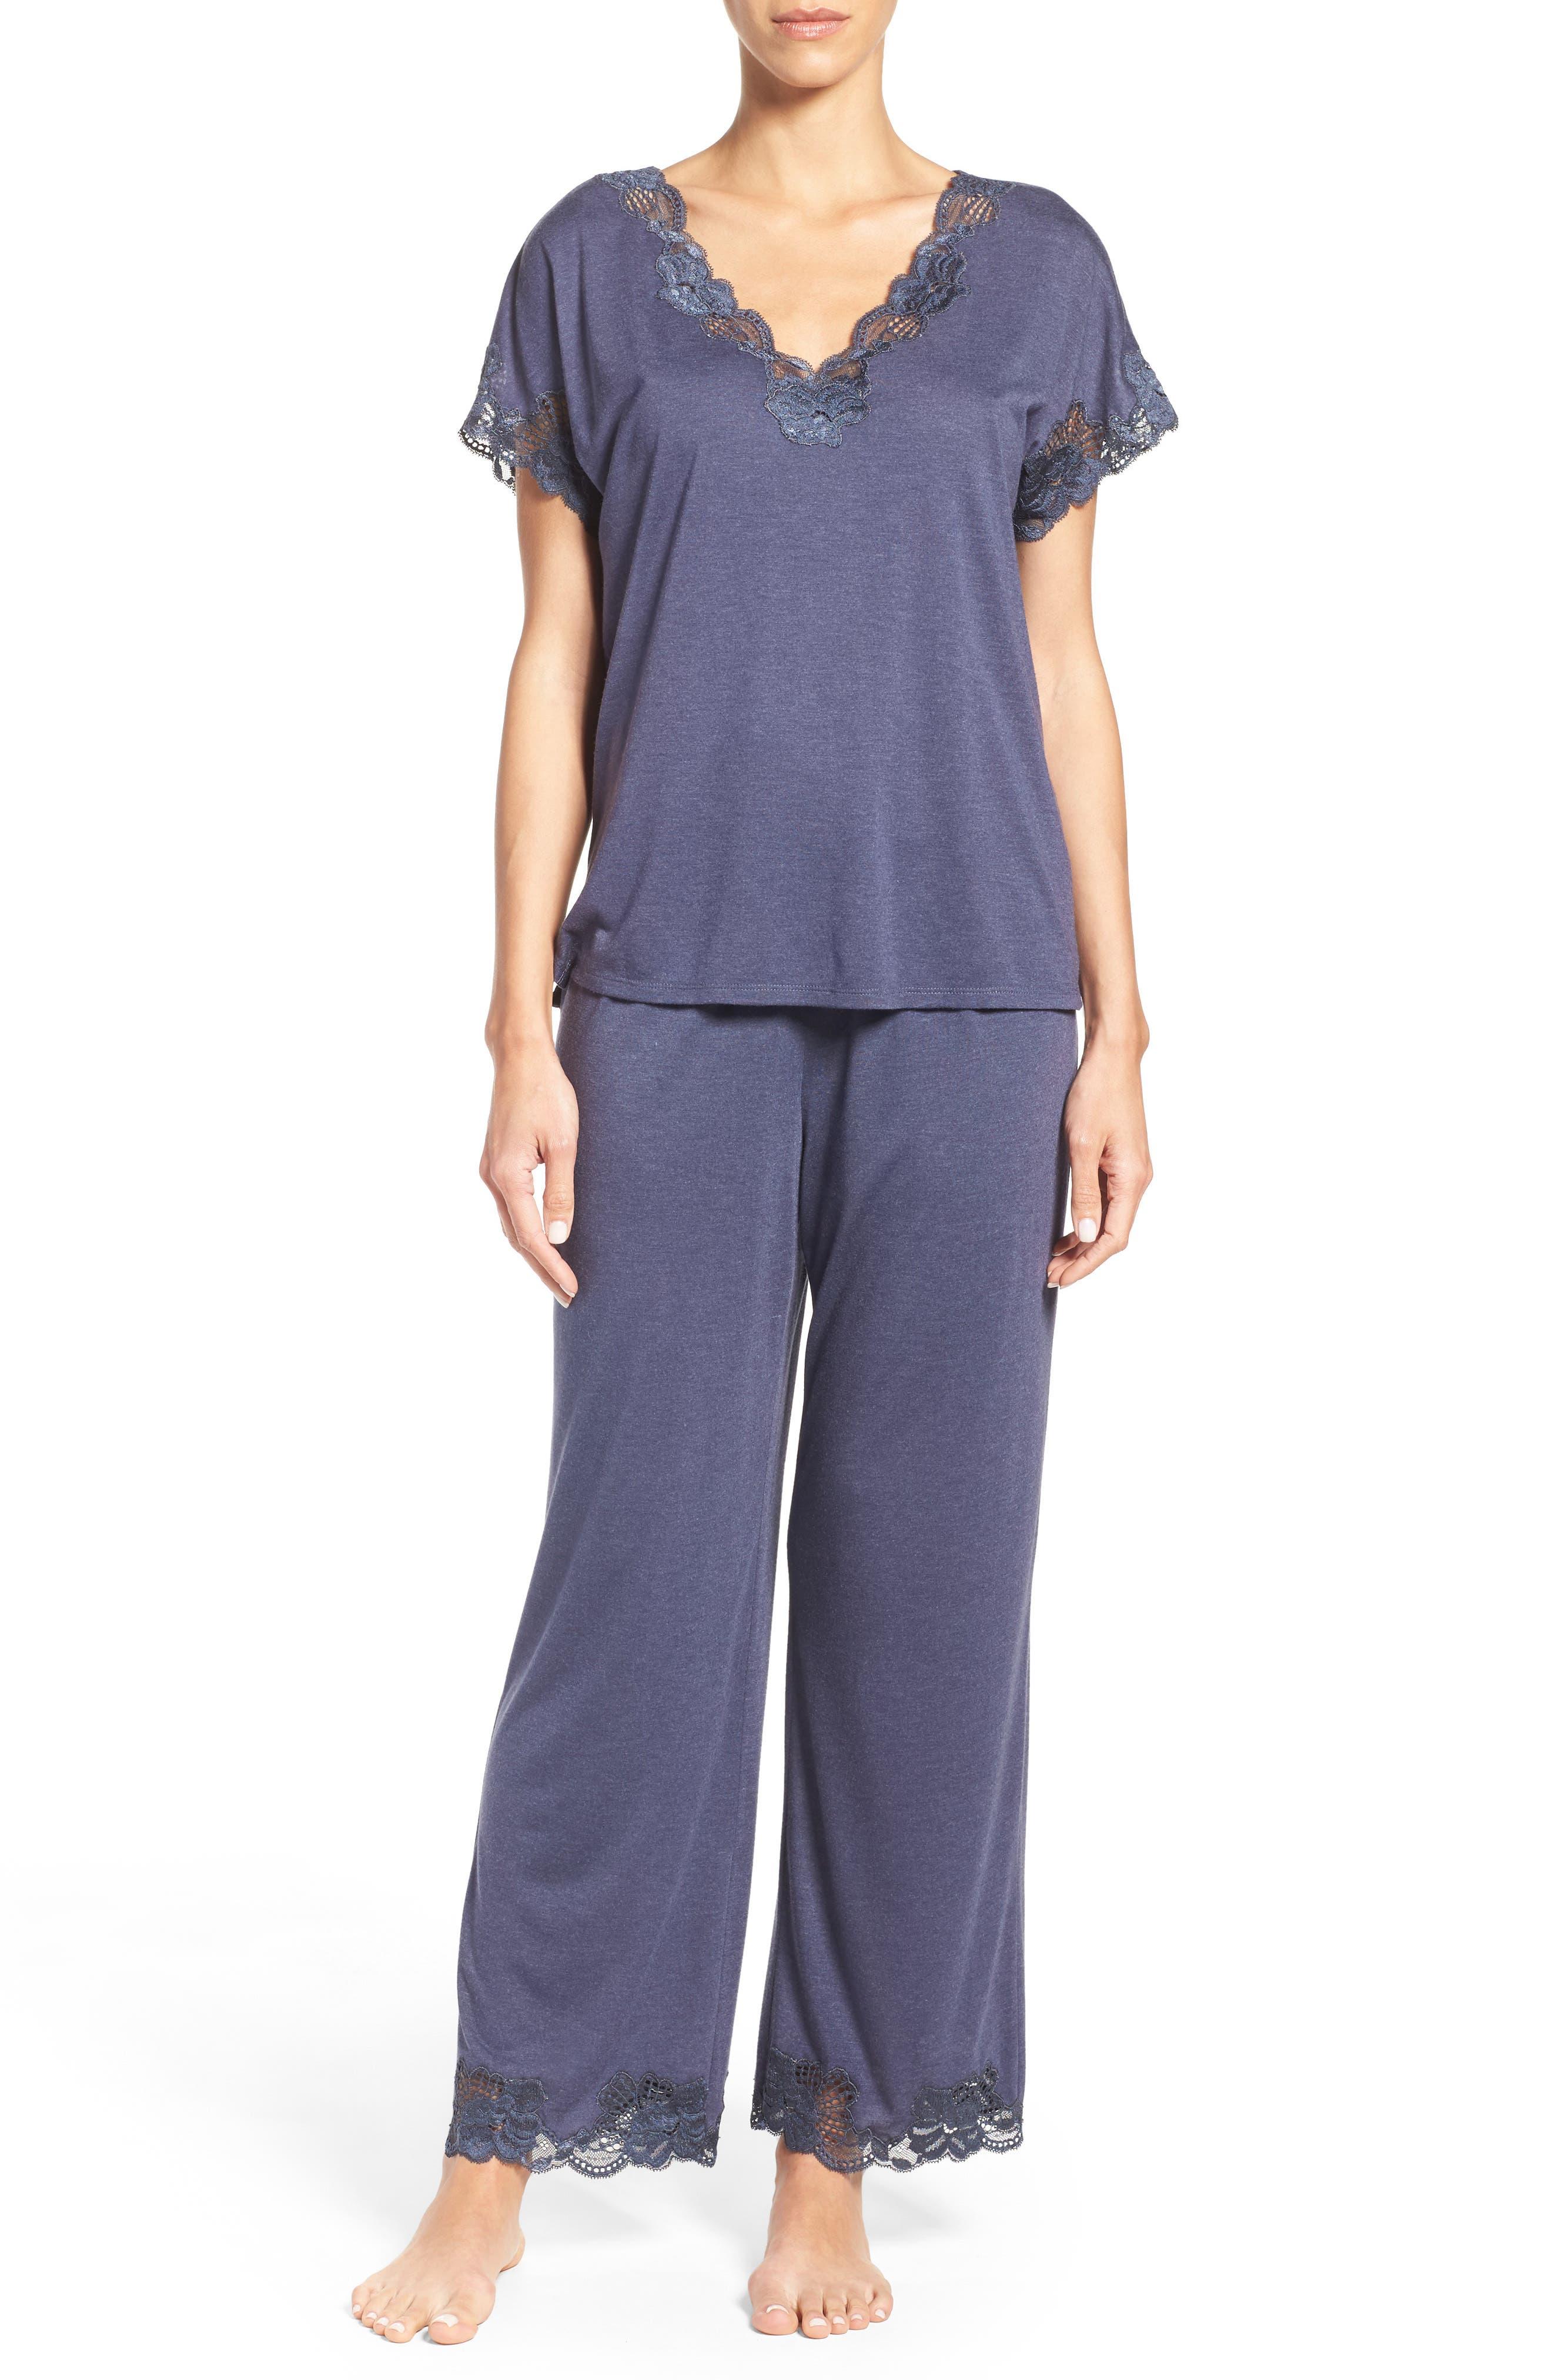 Alternate Image 1 Selected - Natori 'Zen Floral' Pajama Set